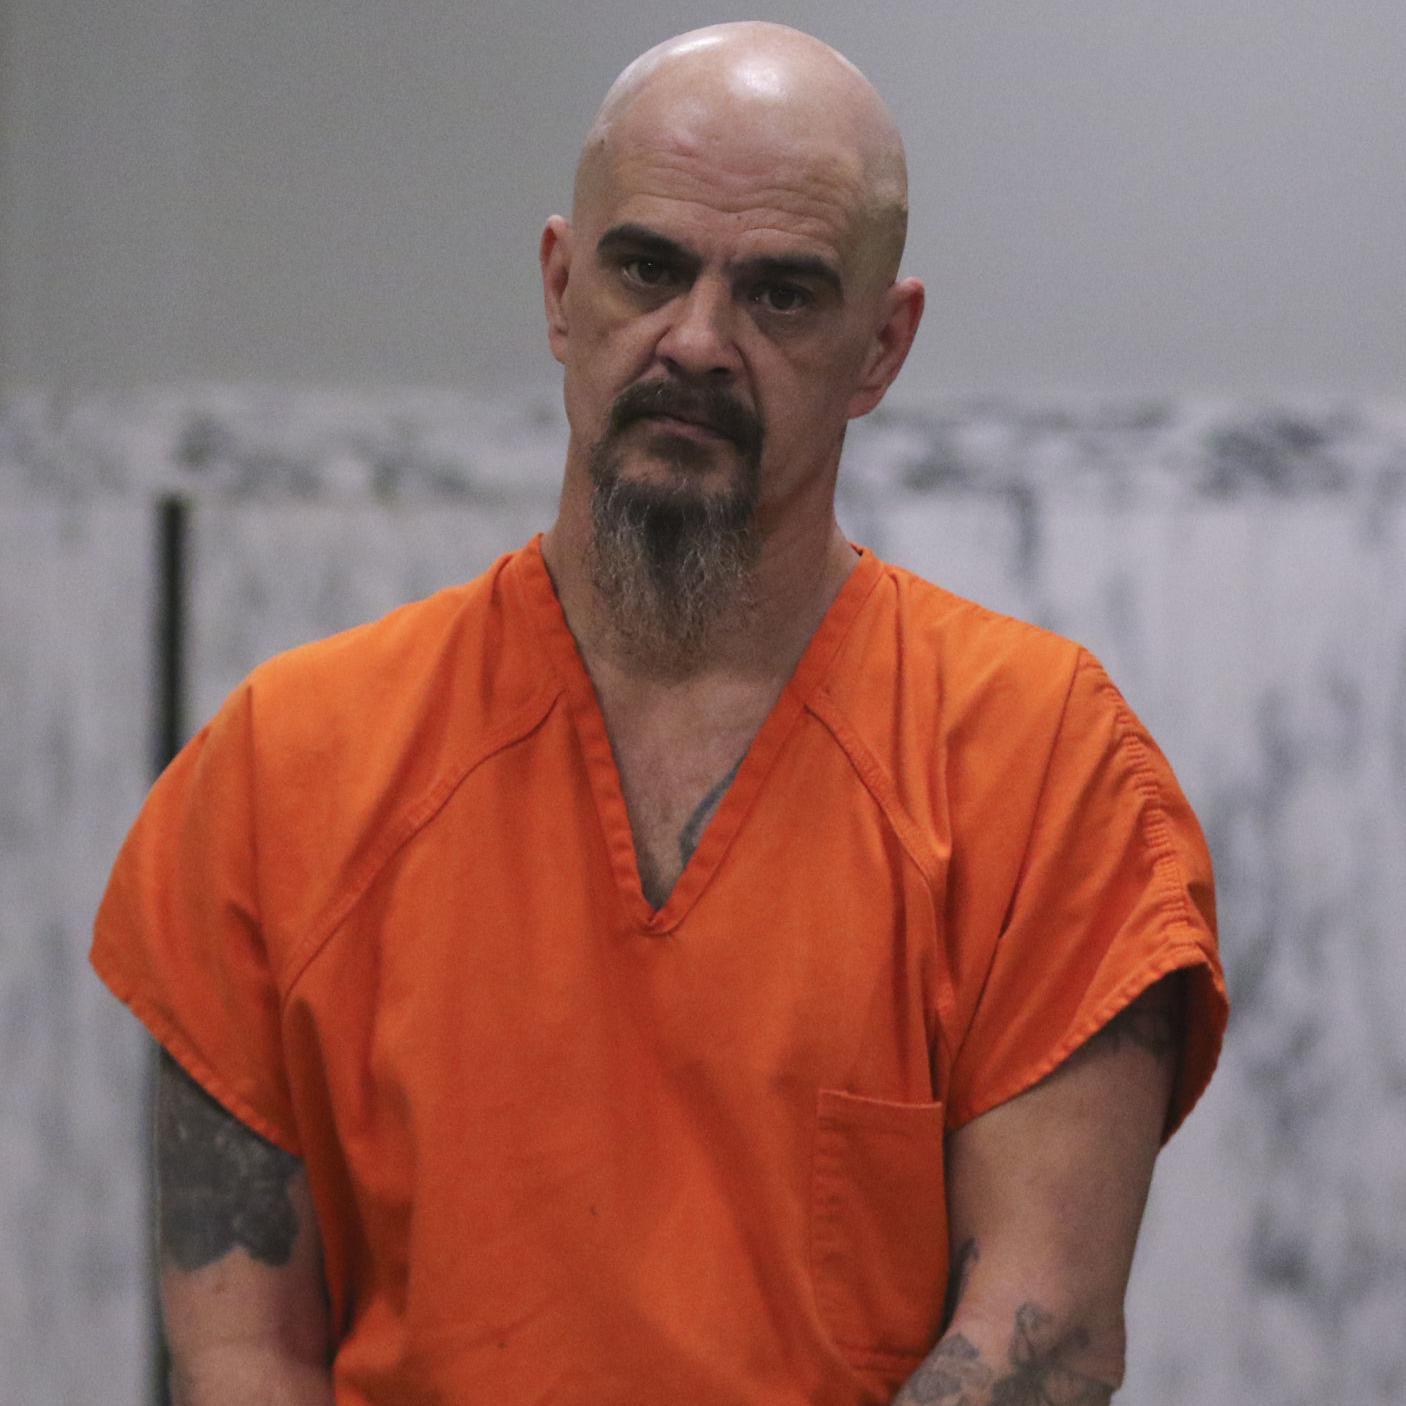 Harrison, WV, judge denies bail for fugitive facing robbery